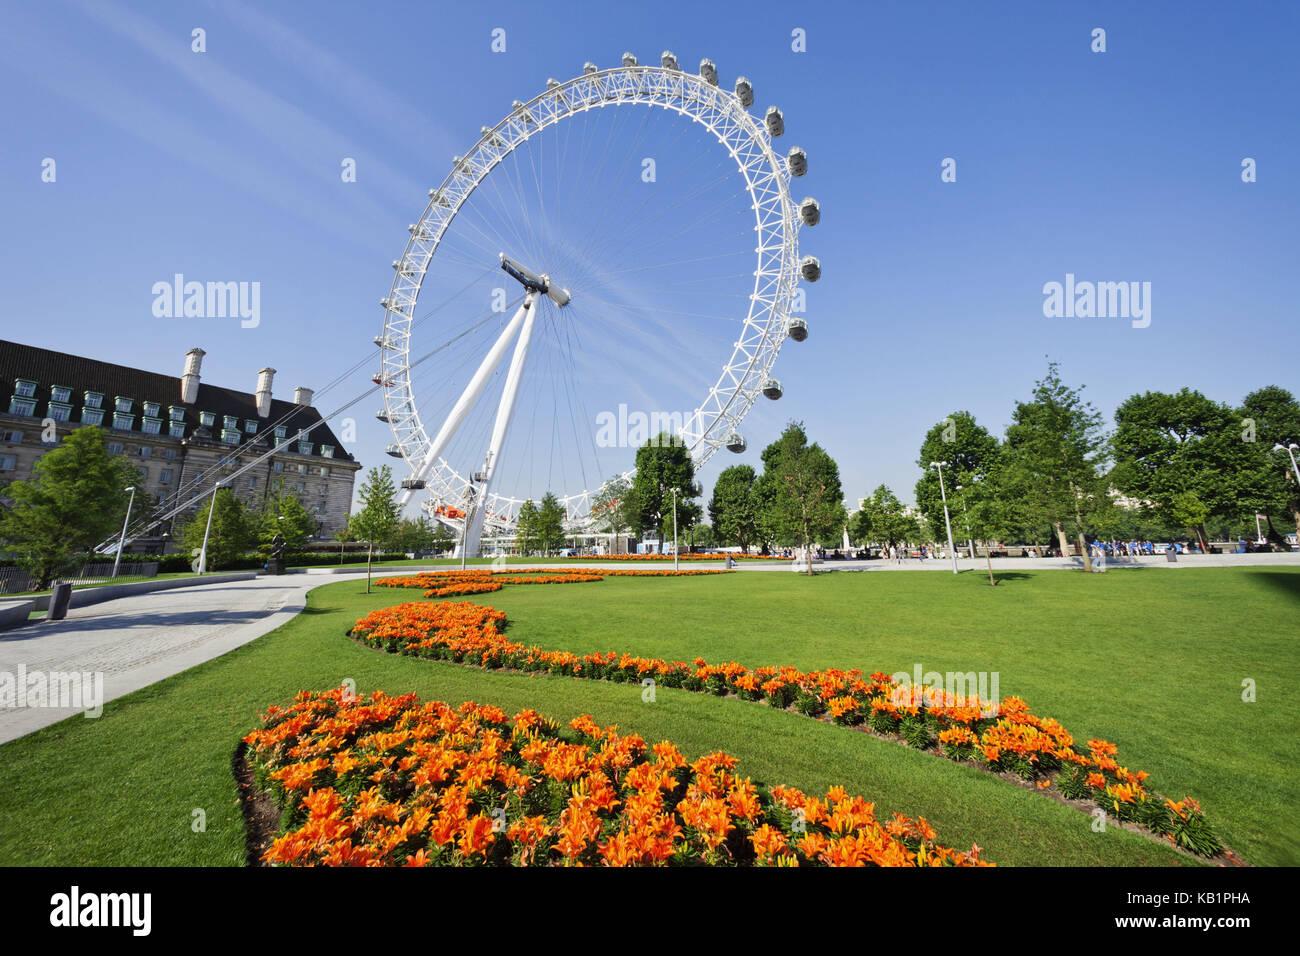 revolving chair thames big joe milano bean bag jubilee gardens london stock photos and